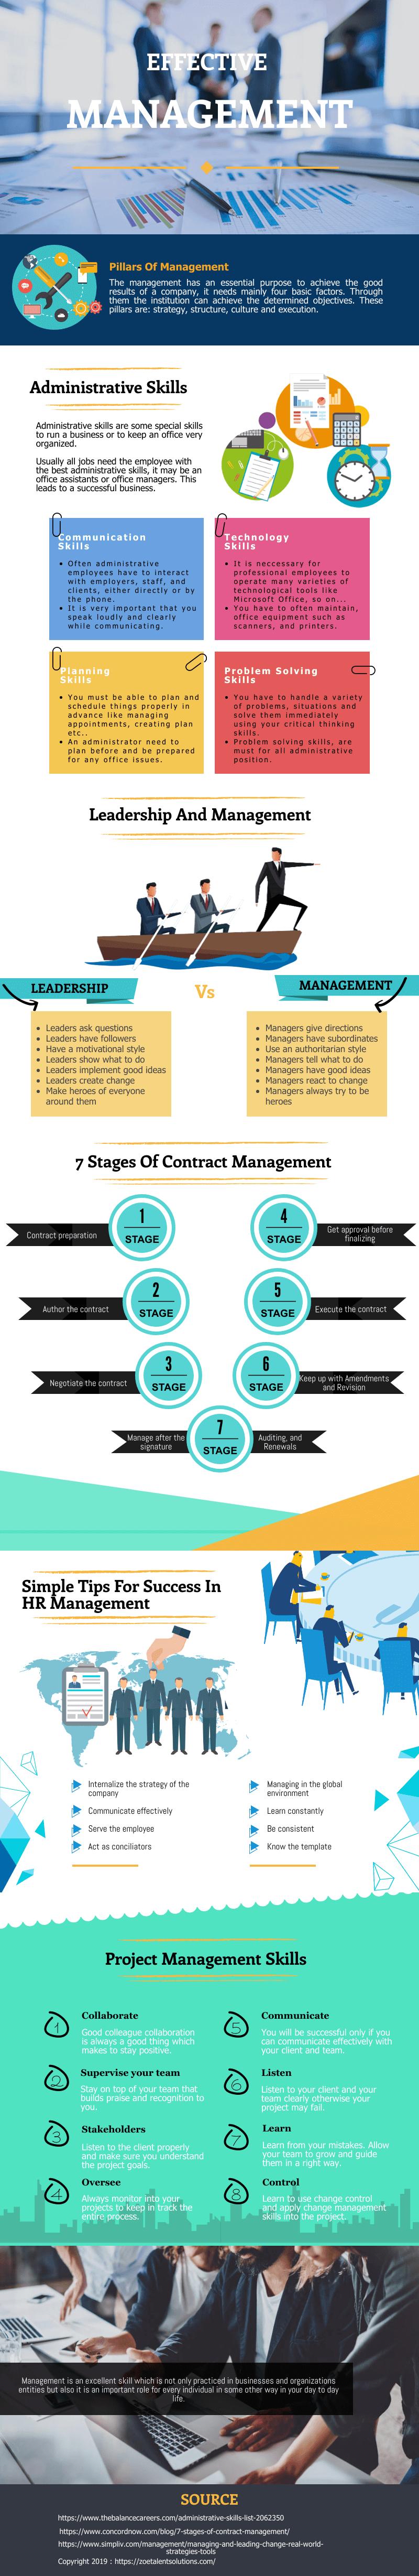 original-infographic-effective-management--1-